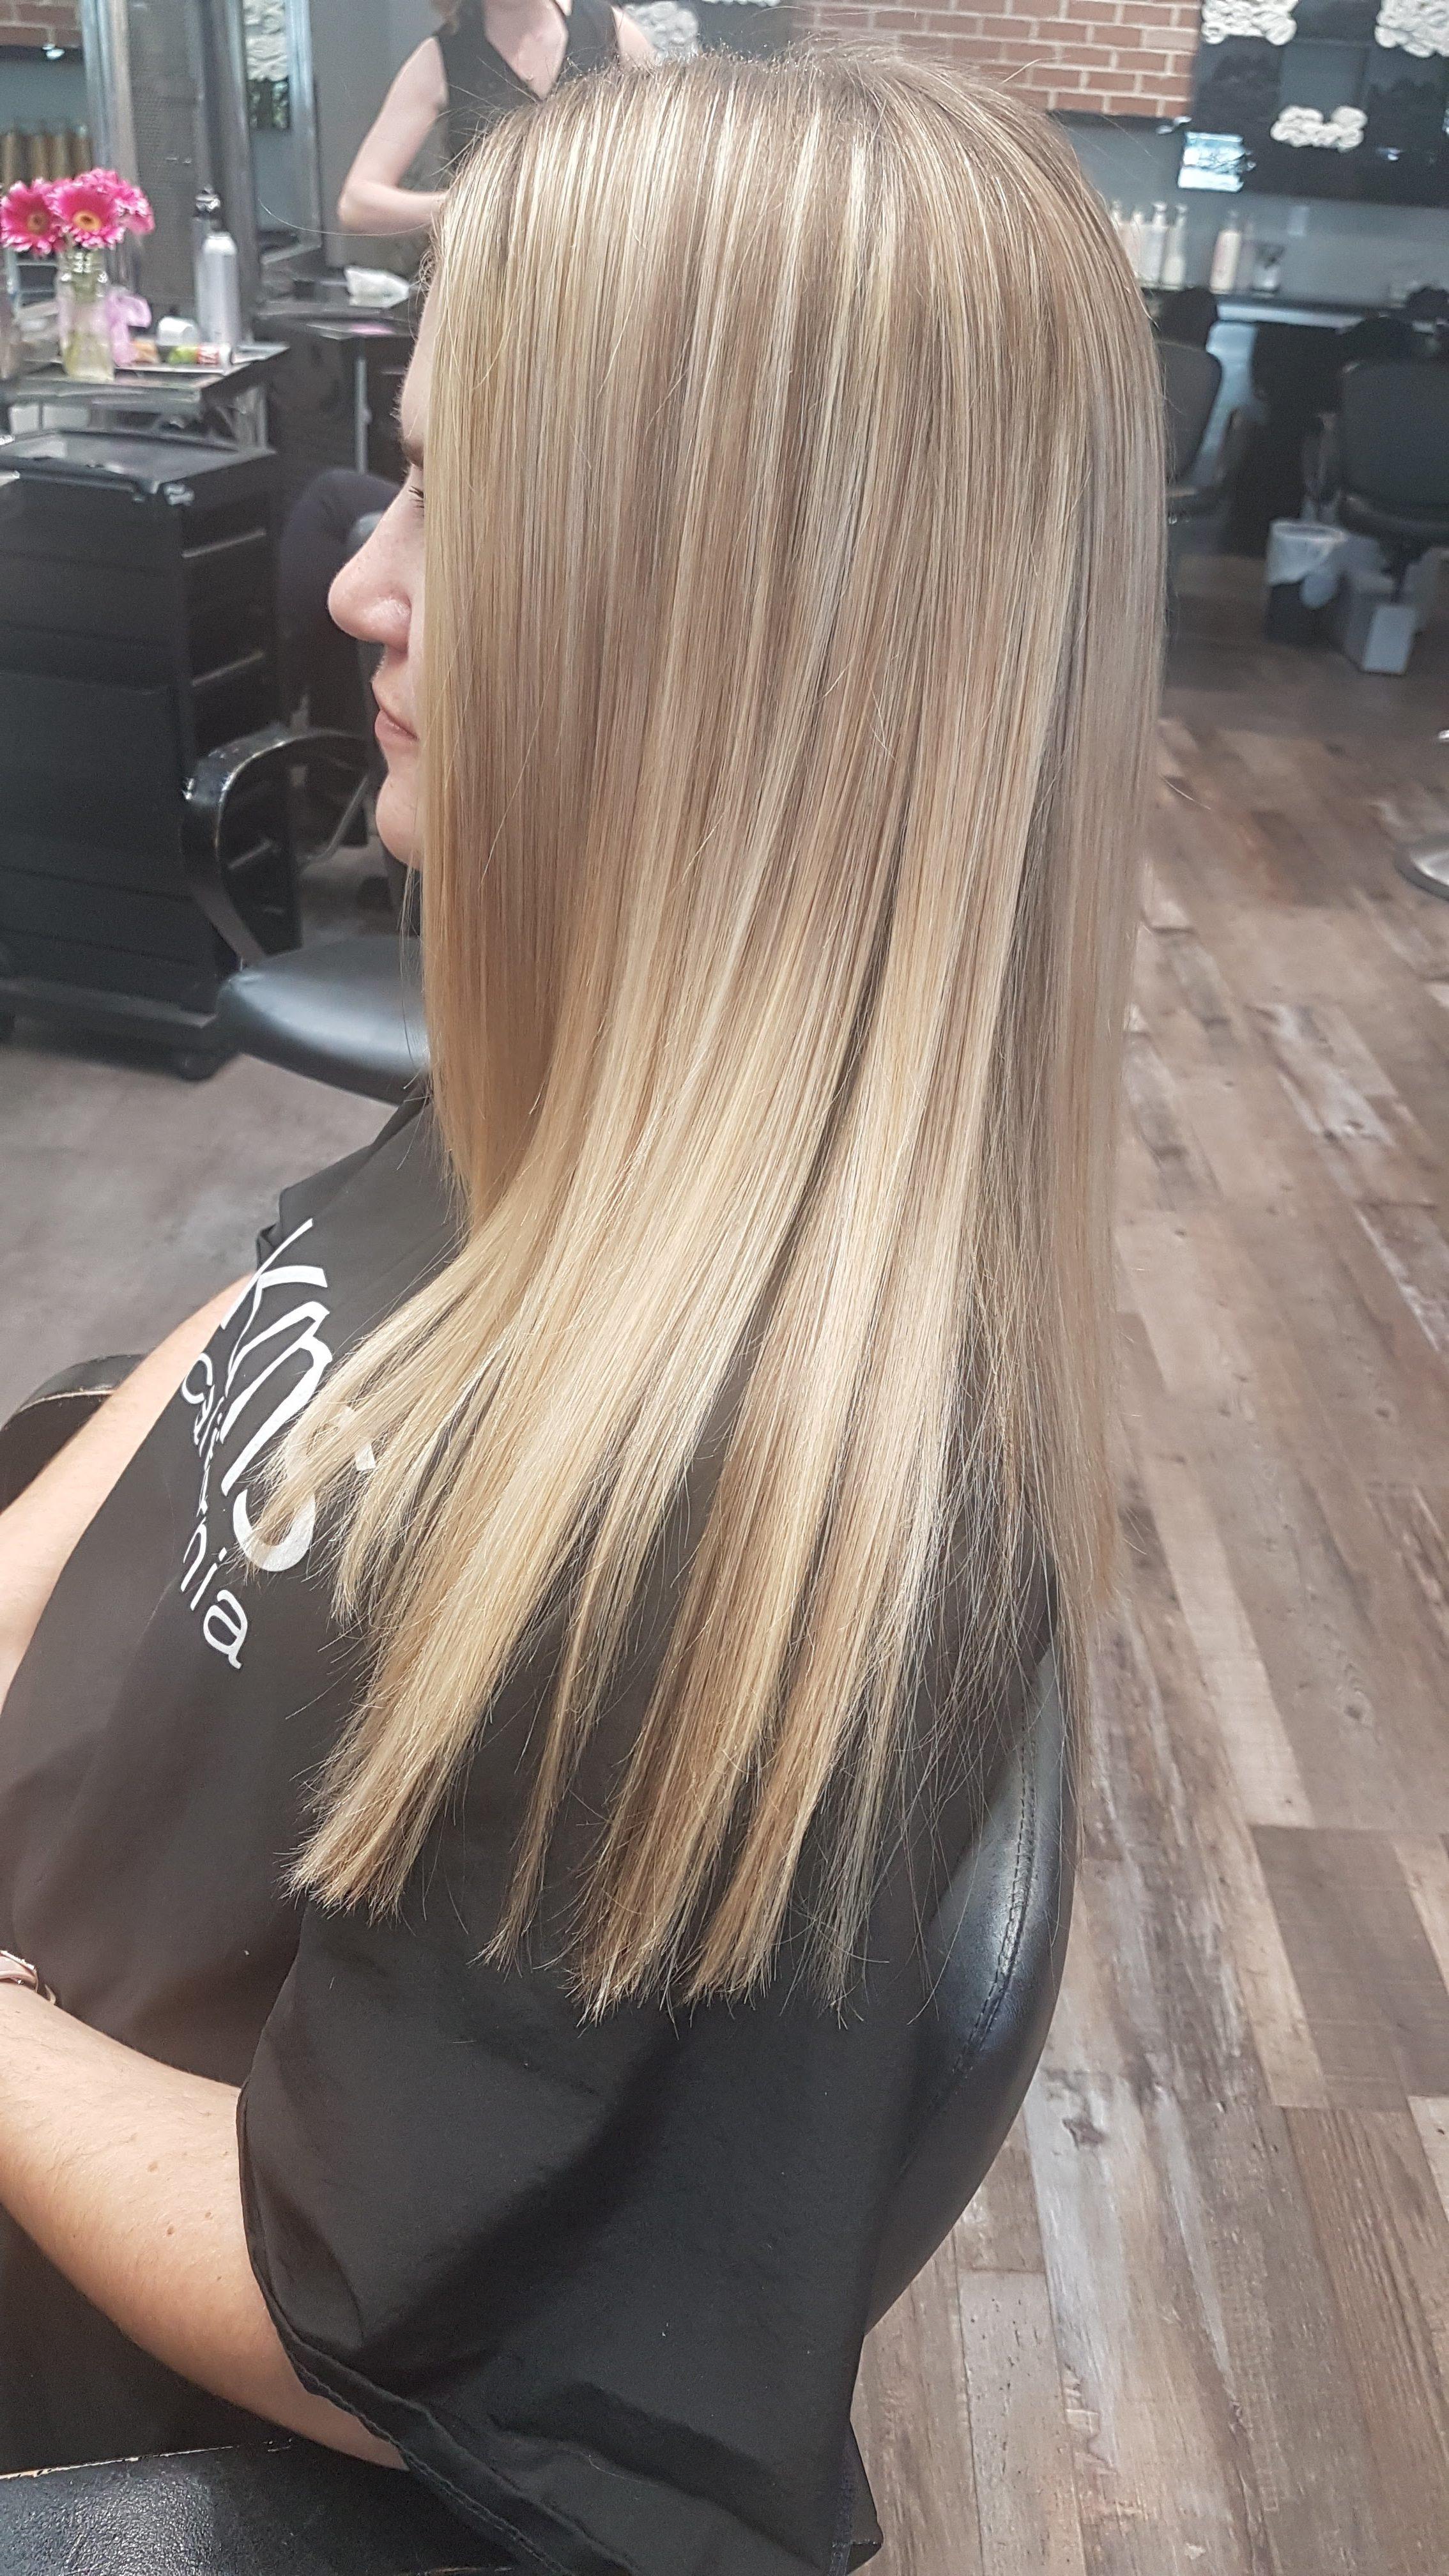 Crushing over Crush Hair Co.'s keratin smoothing treatment